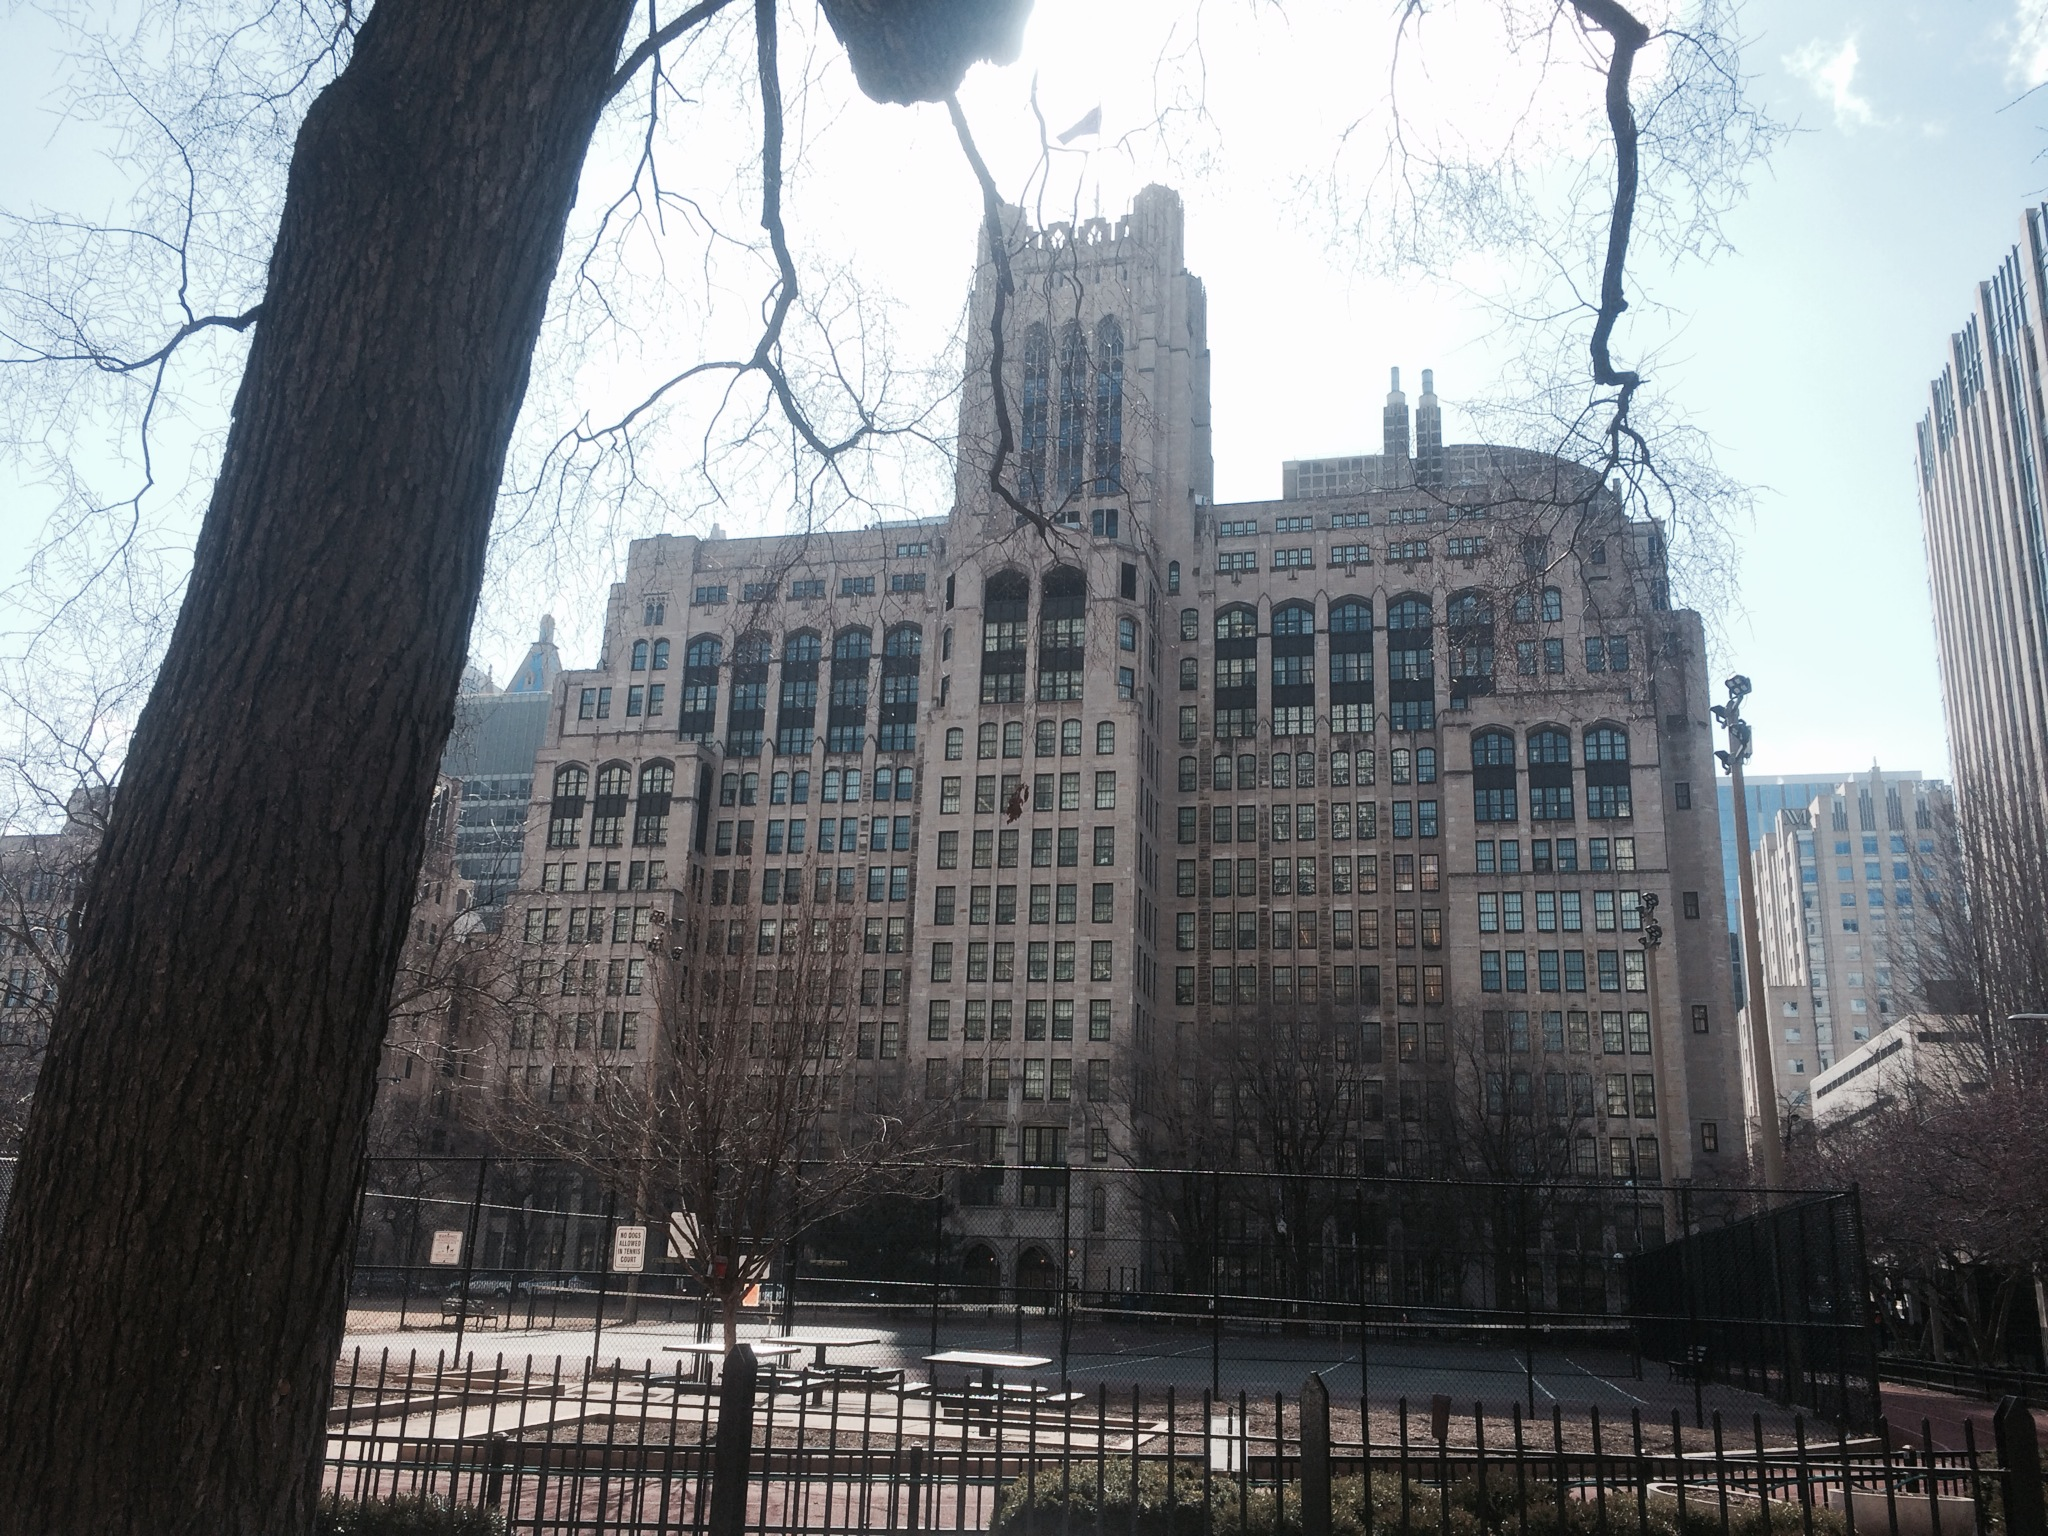 303 East Chicago Ave. - NorthWestern School of Medicine Ward Memorial Building today.